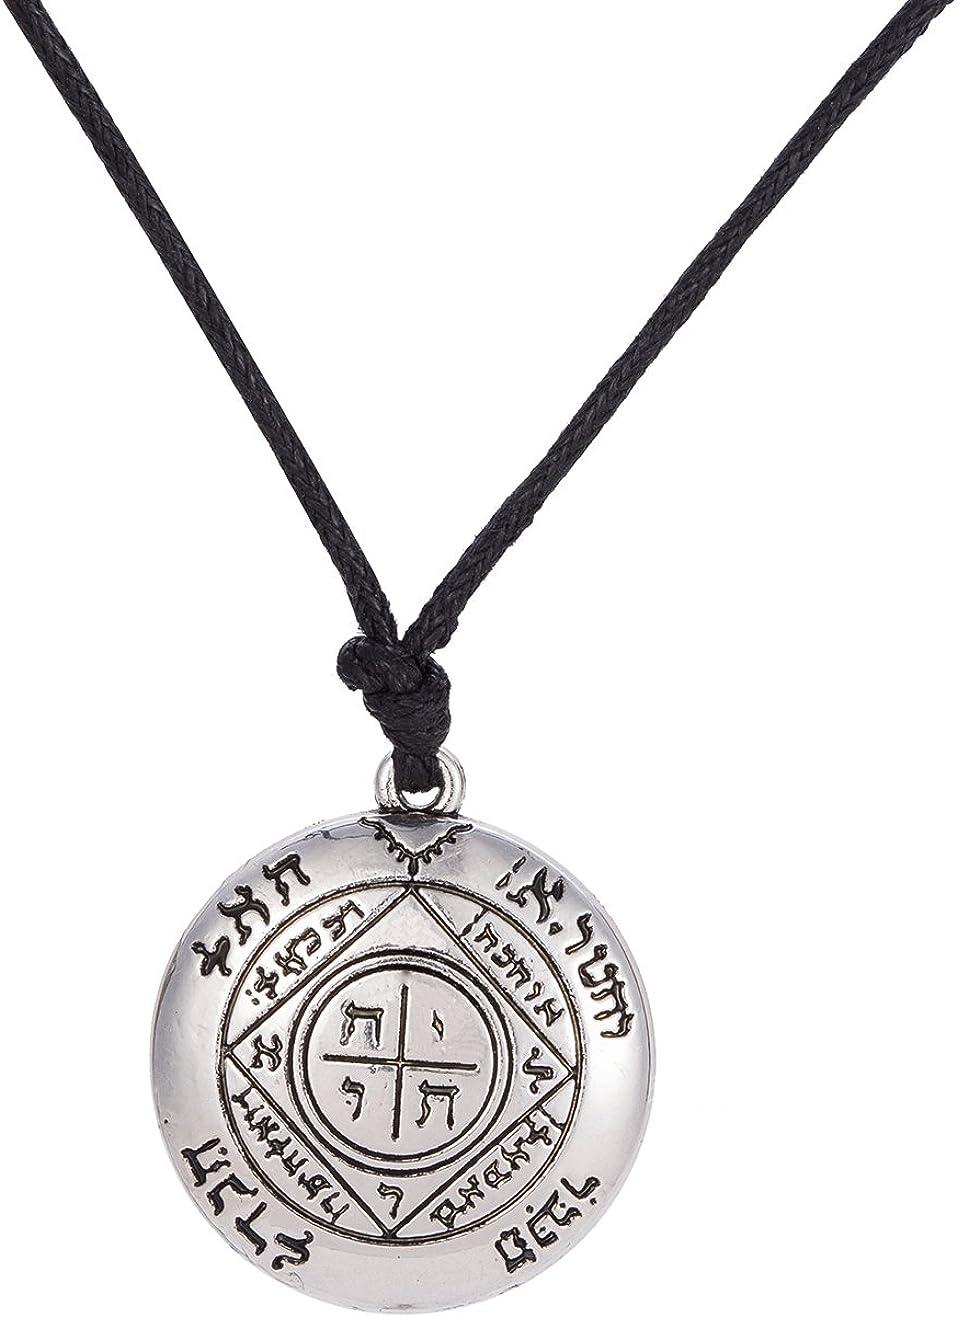 Dawapara Gothic The Third Pentacle of Jupiter King Solomon Seal Pendant Necklace Gift Jewelry